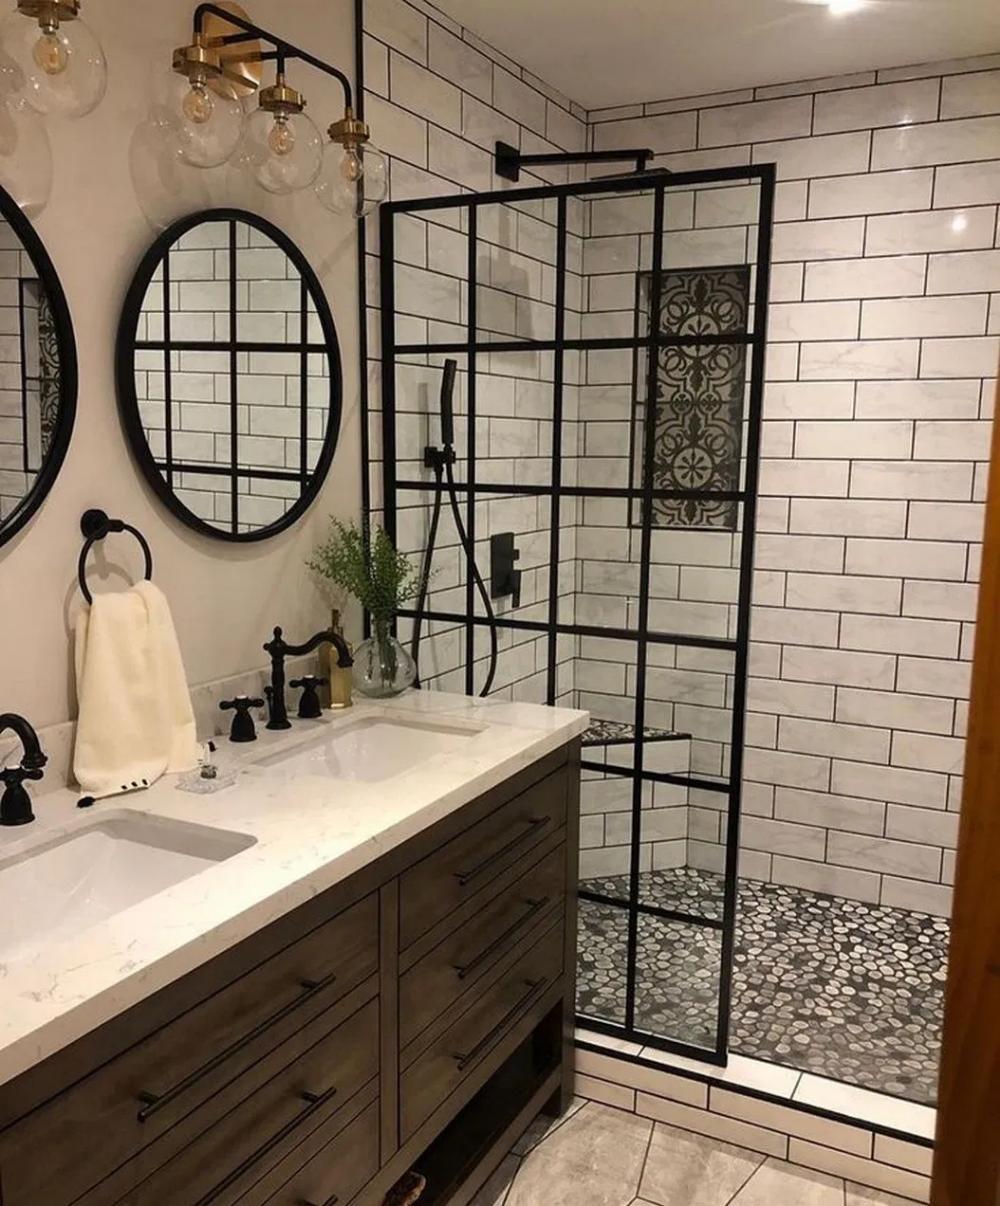 35 Beautiful Bathroom Color Scheme Ideas For Small Master Bathroom 1 In 2020 Modern Bathroom Renovations Bathroom Transformation Bathroom Design